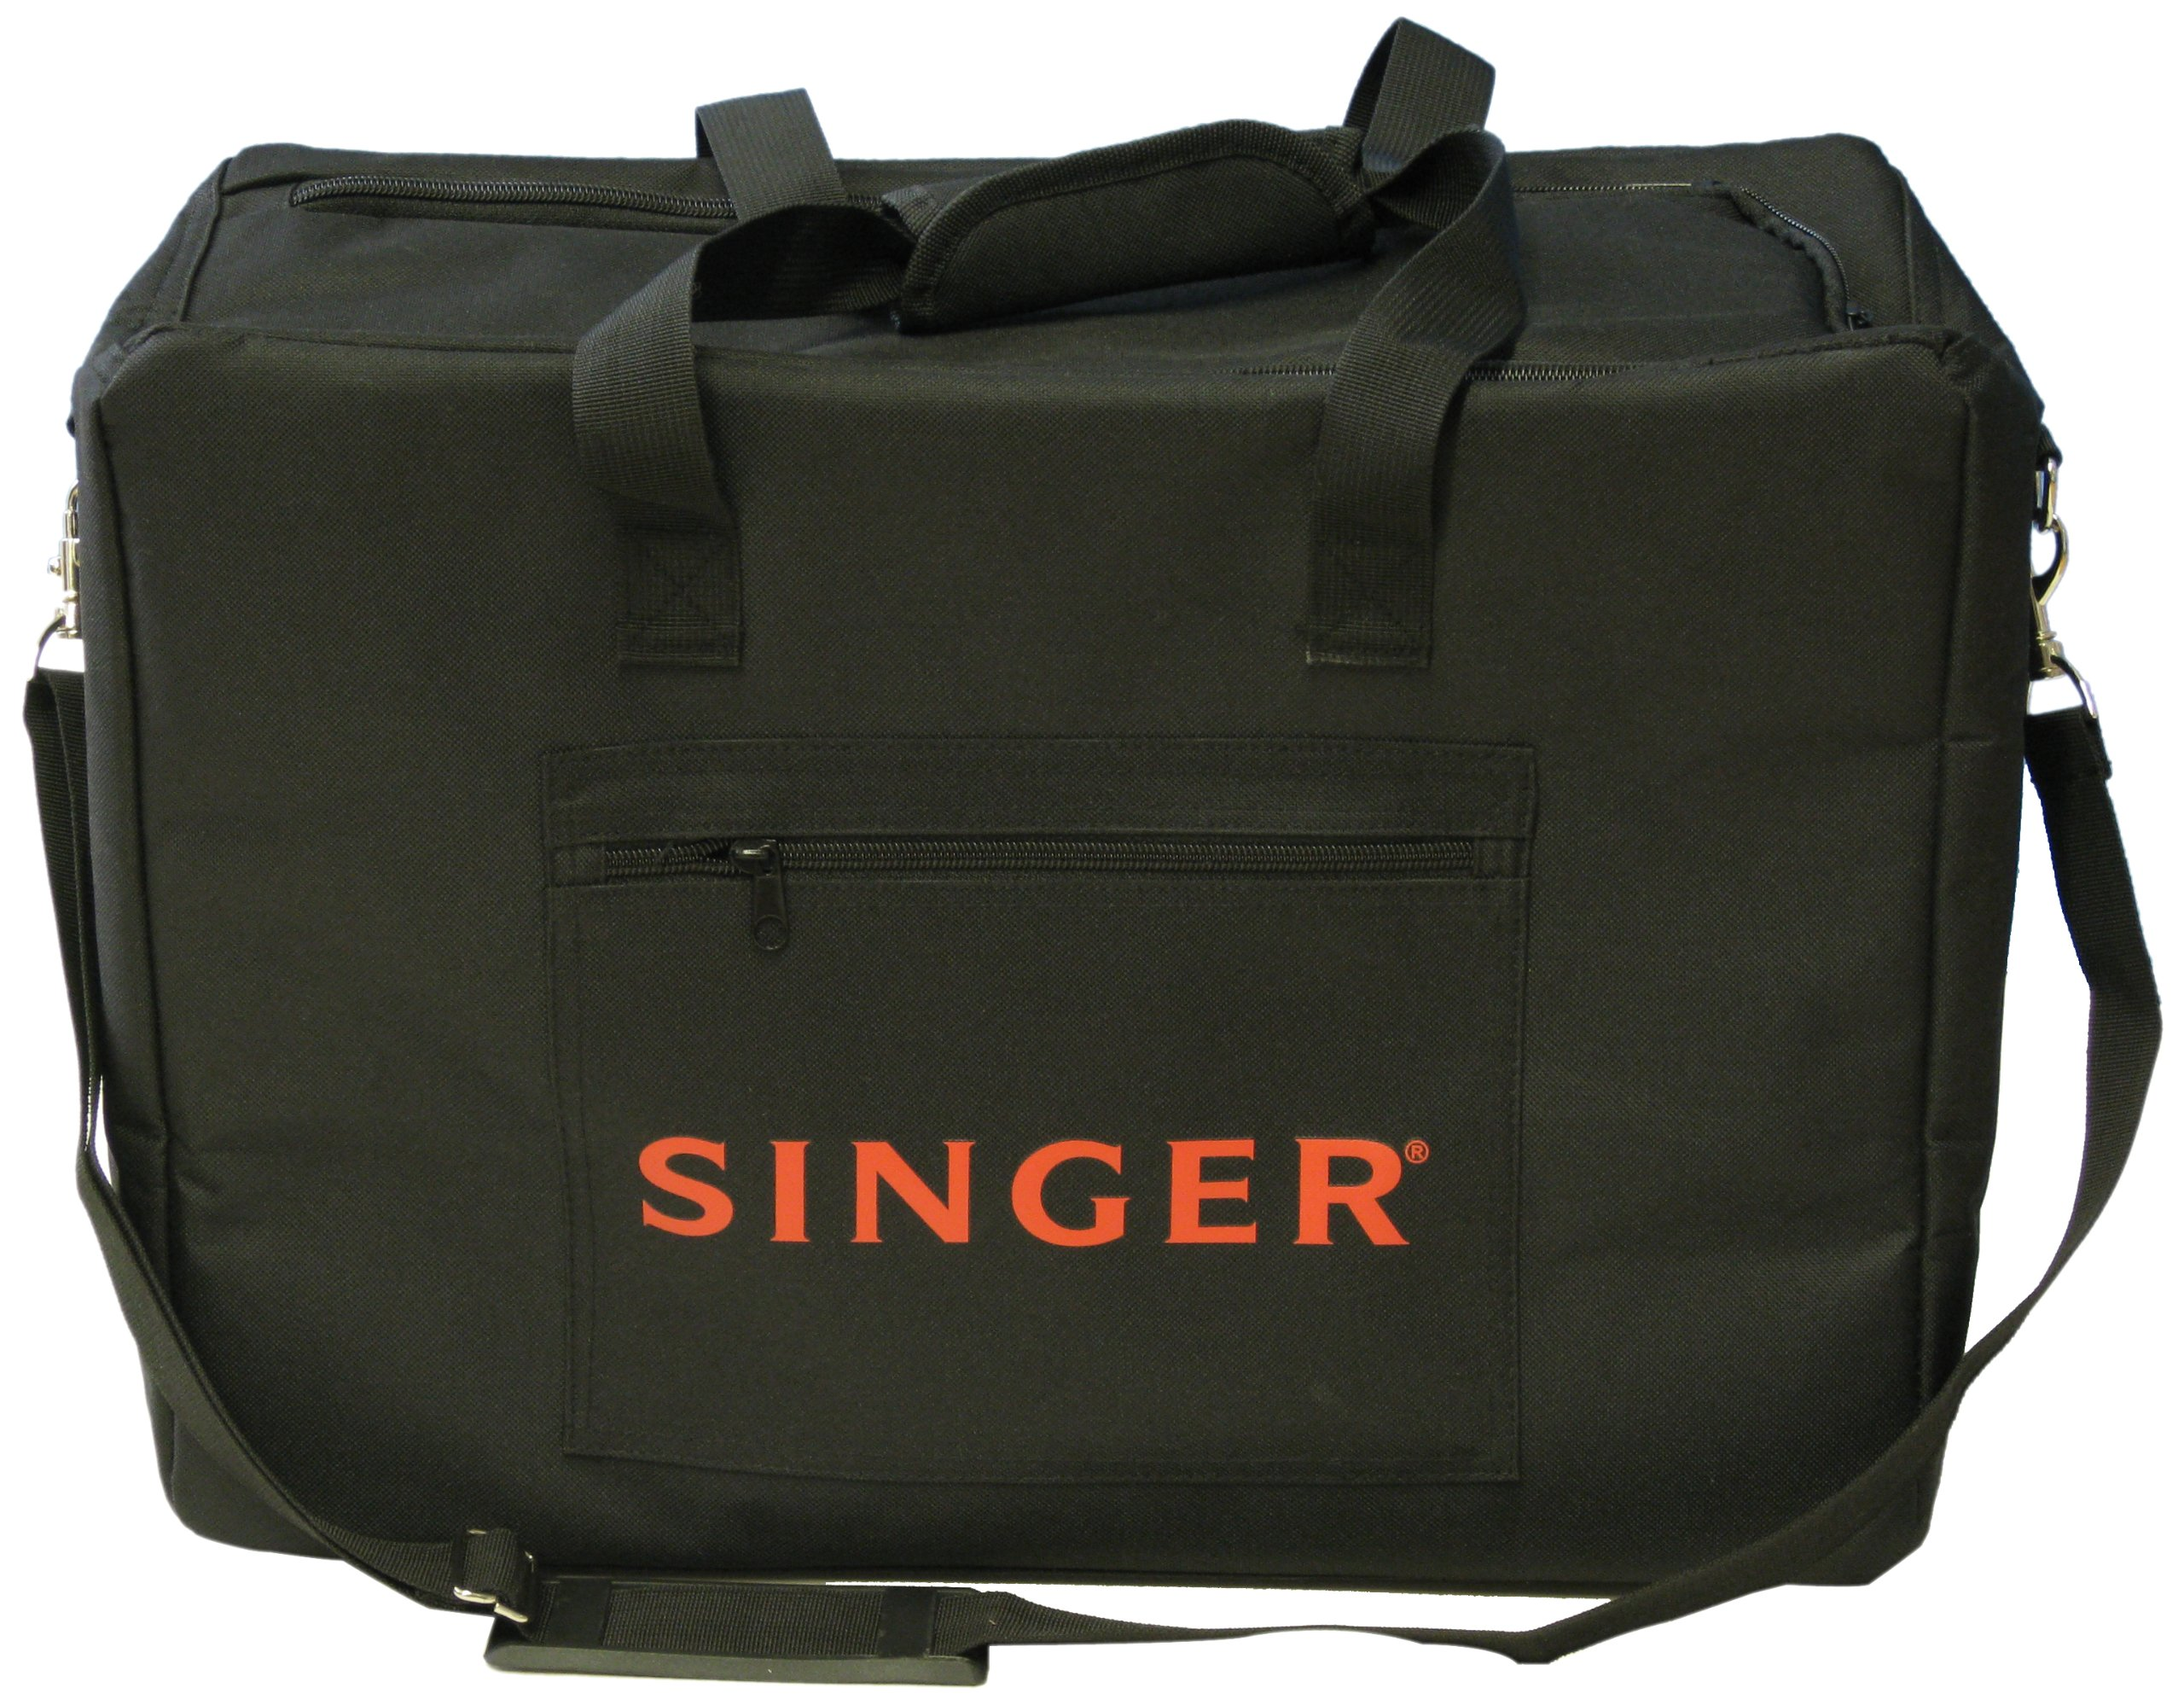 Singer - Funda para máquina de coser, color negro product image